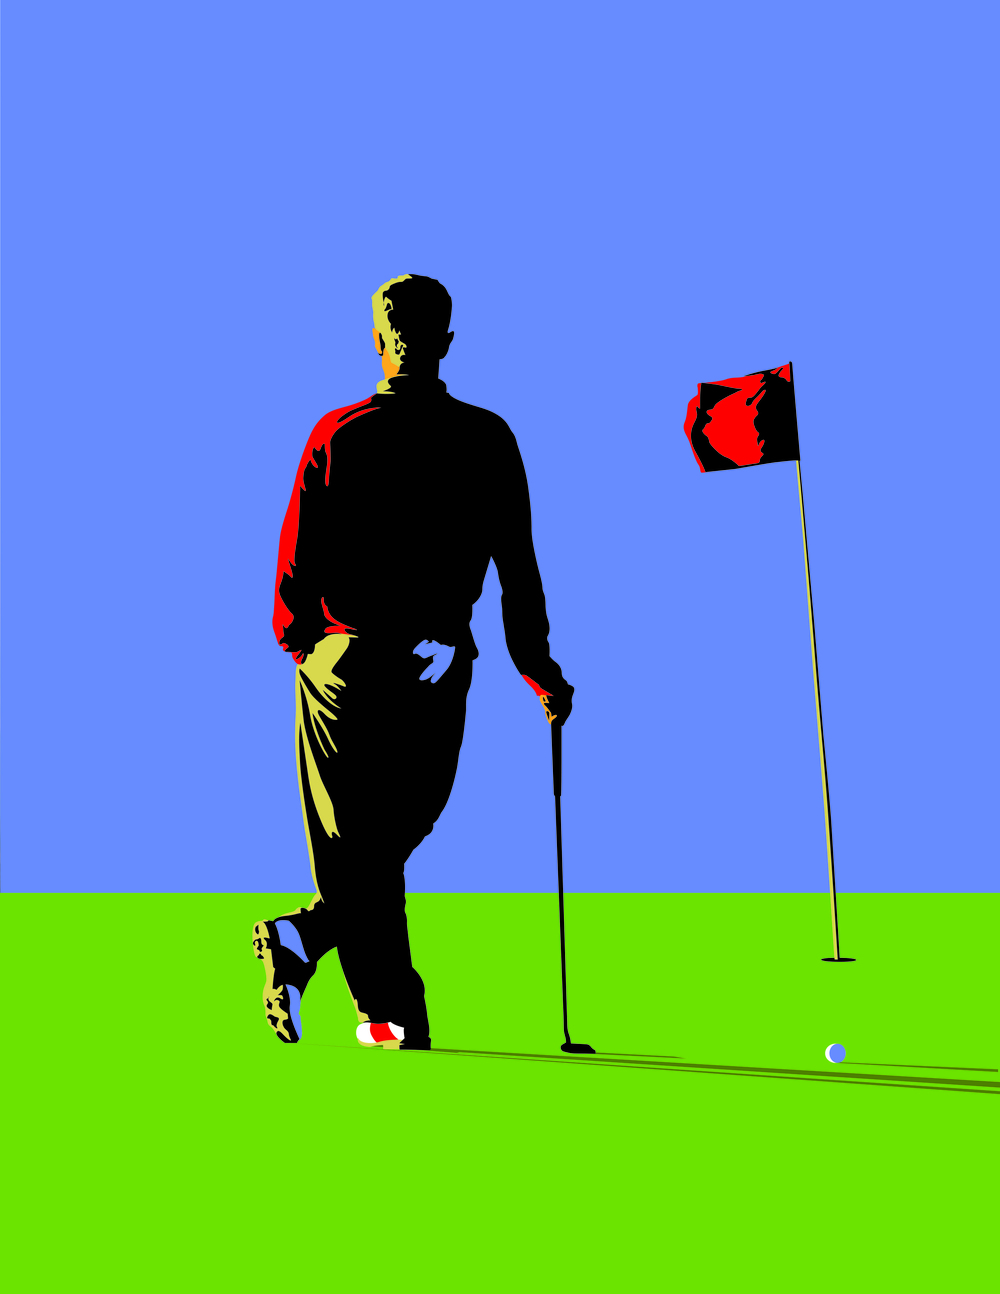 Graphic Illustration of Golfer